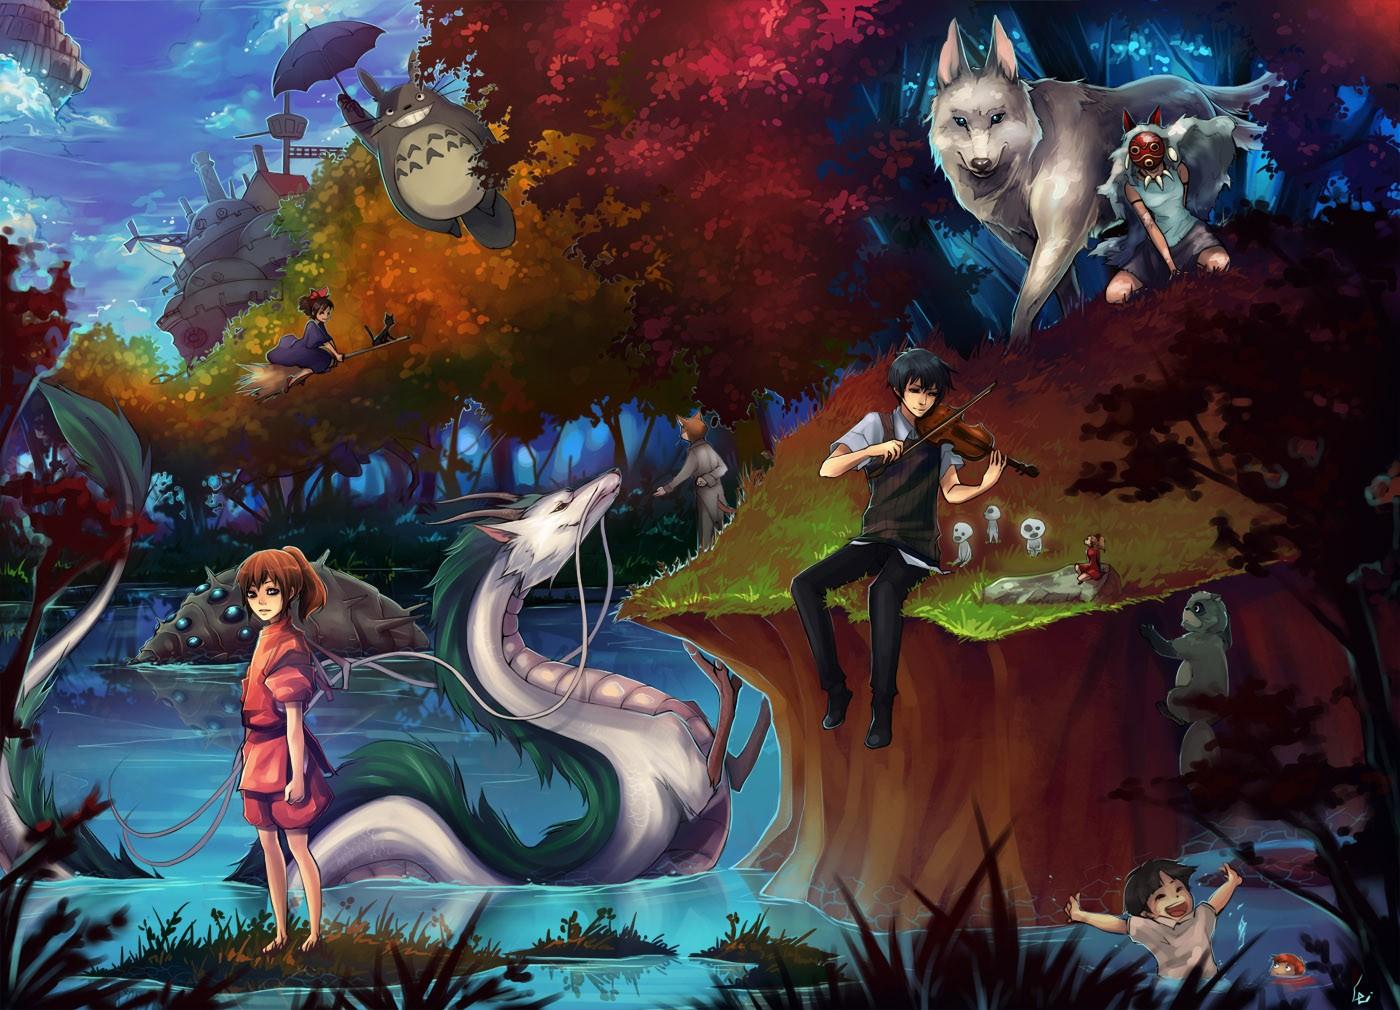 Wallpaper Illustration Anime Spirited Away Dragon Princess Mononoke My Neighbor Totoro Studio Ghibli Nausicaa Of The Valley Wind Mythology